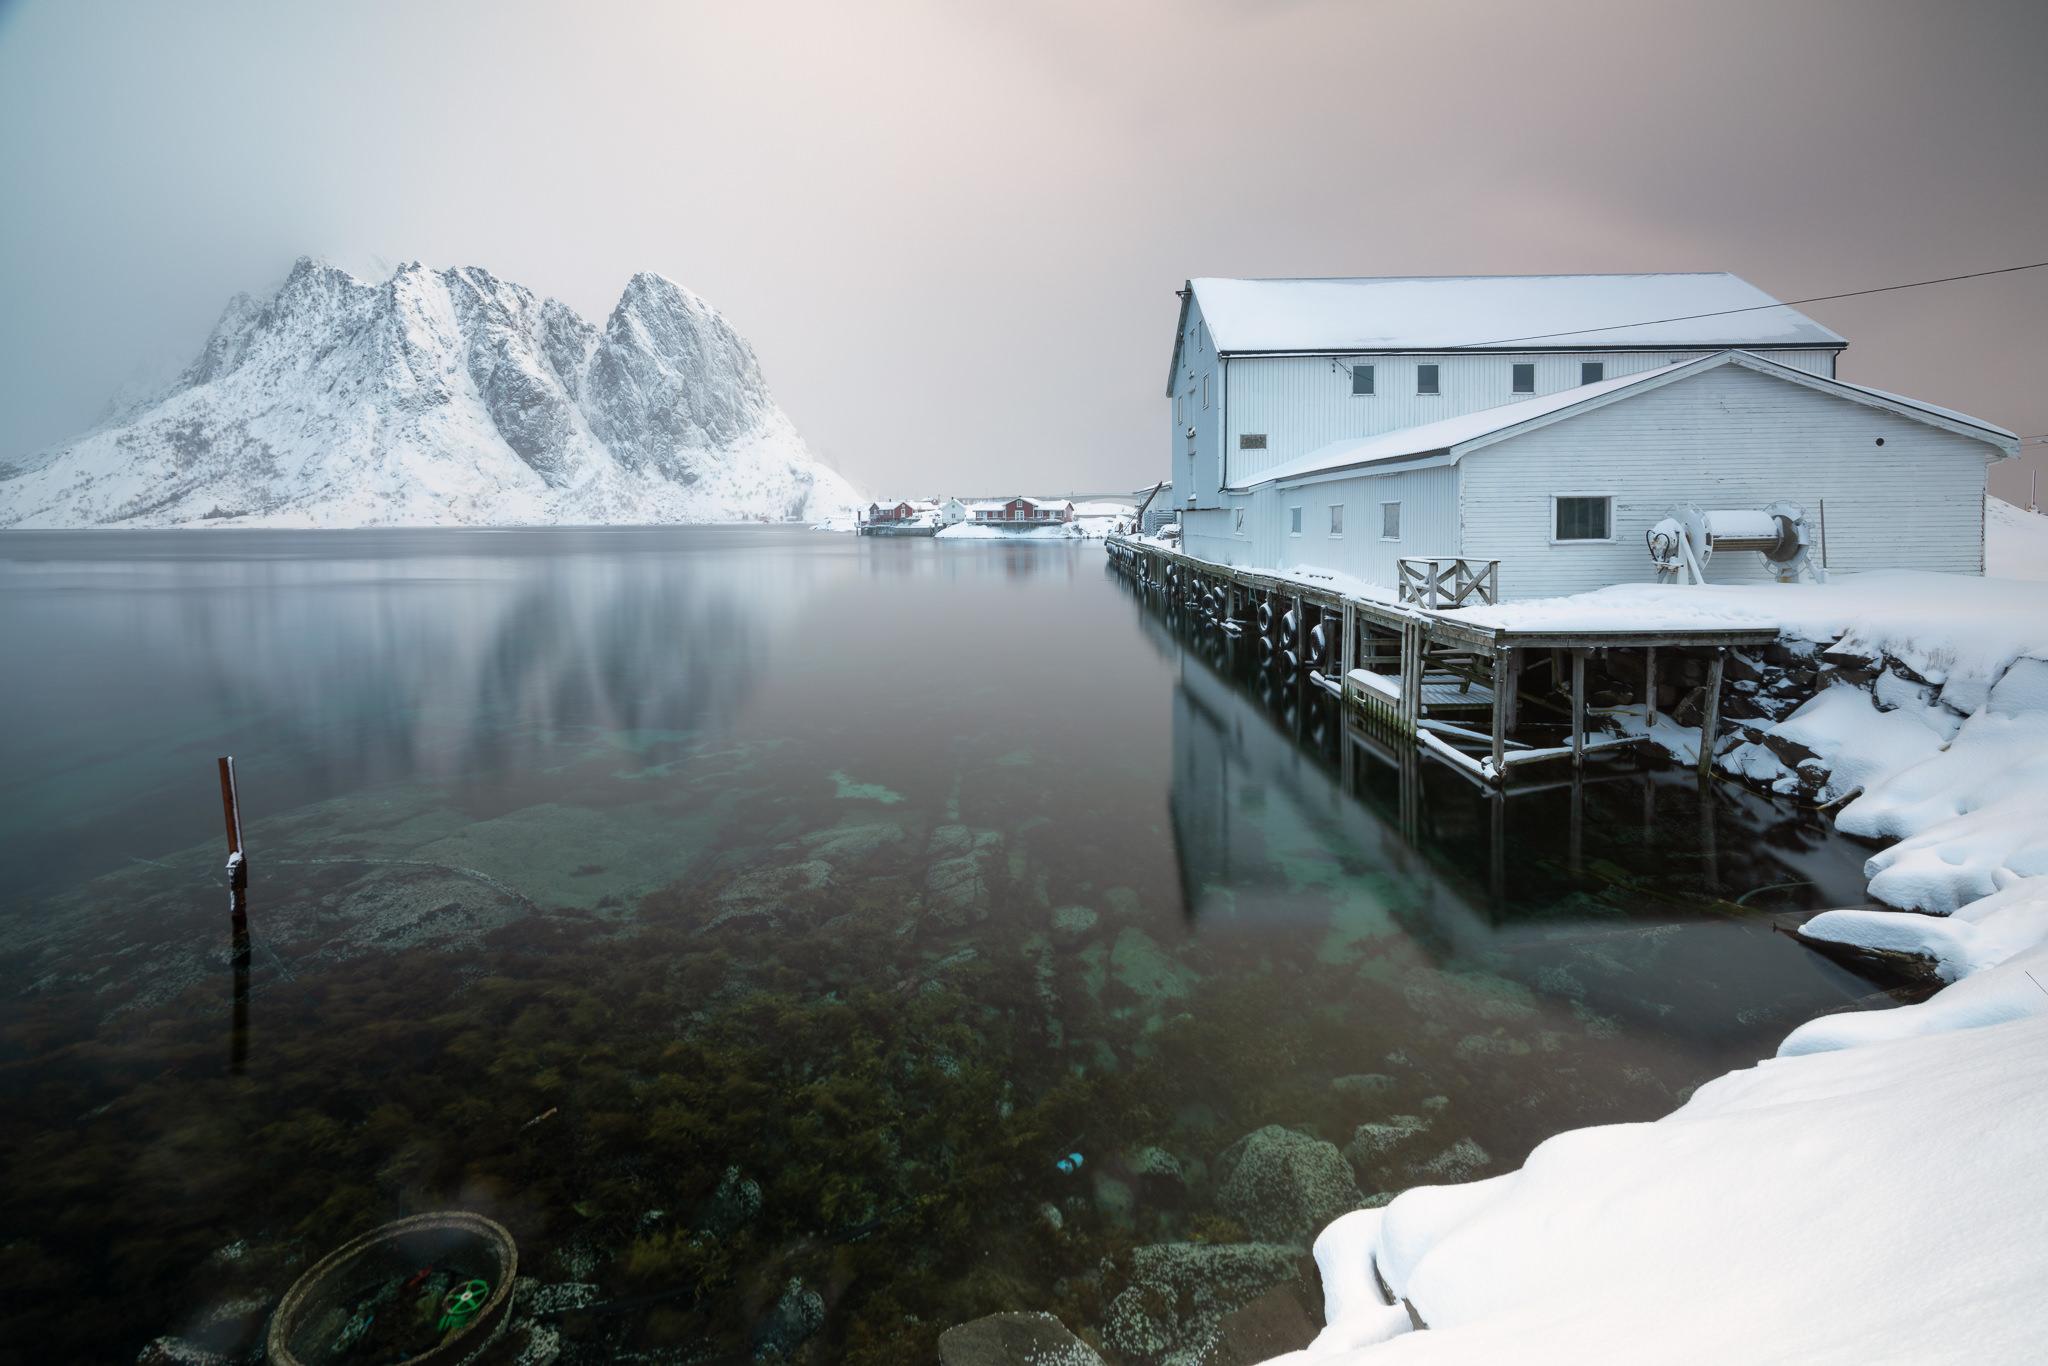 Lofoten, Norway - another shot taken in beautiful Moskenes area.